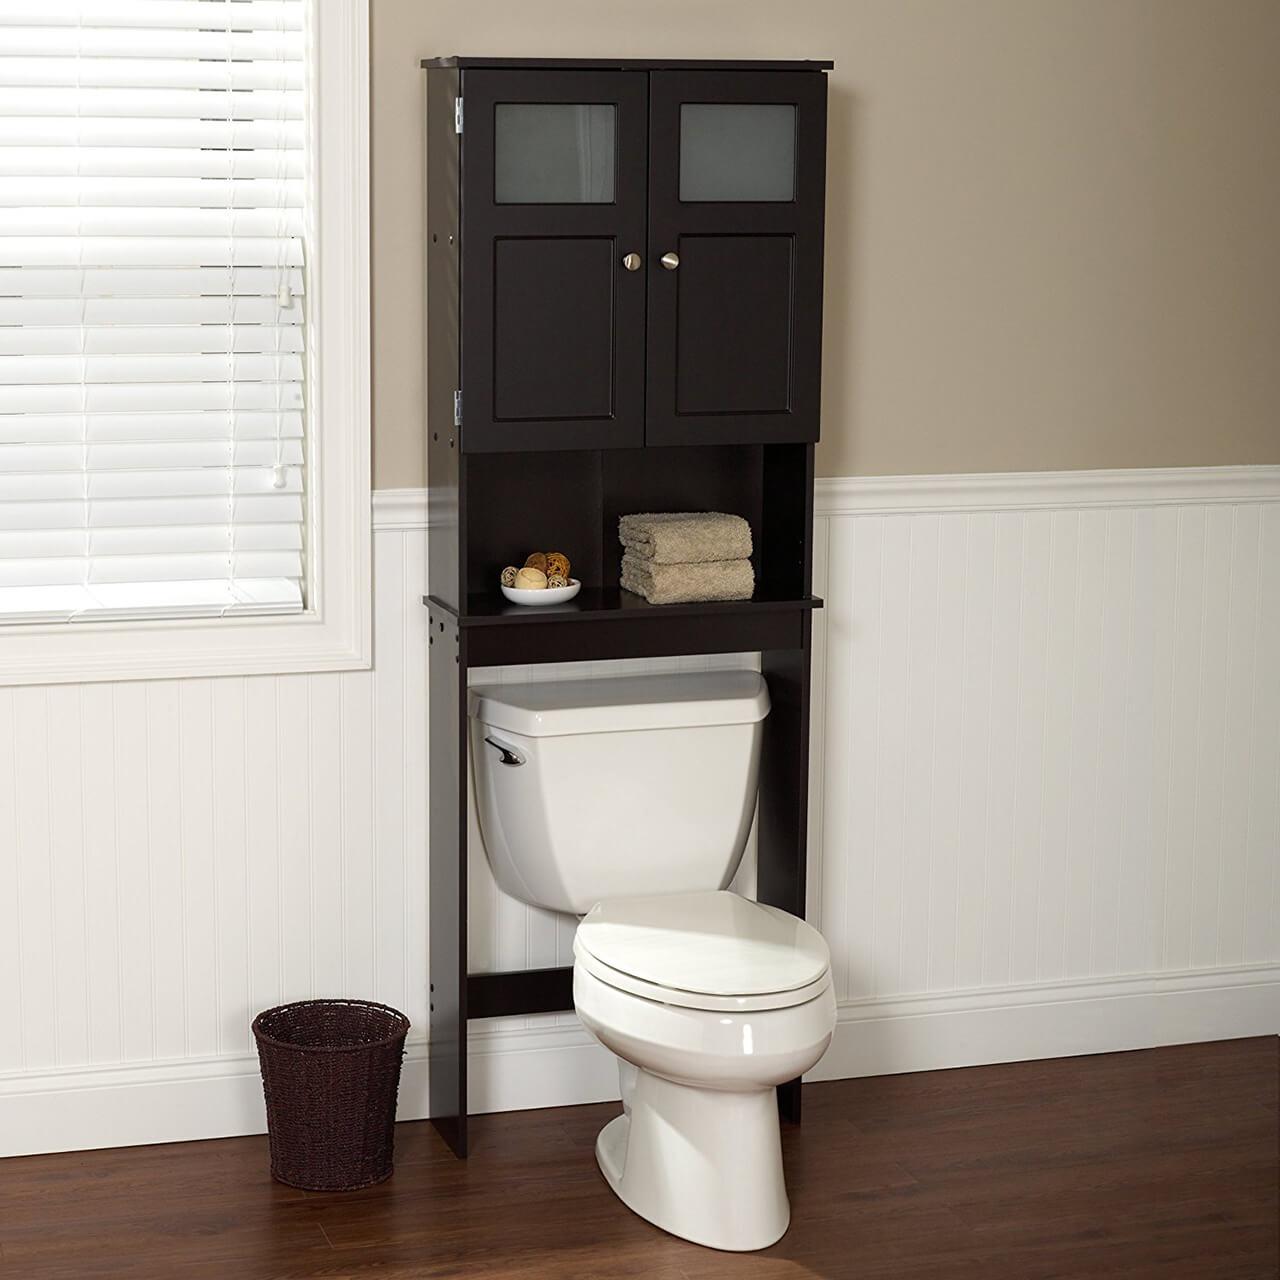 Fullsize Of Bathroom Cabinet Ideas